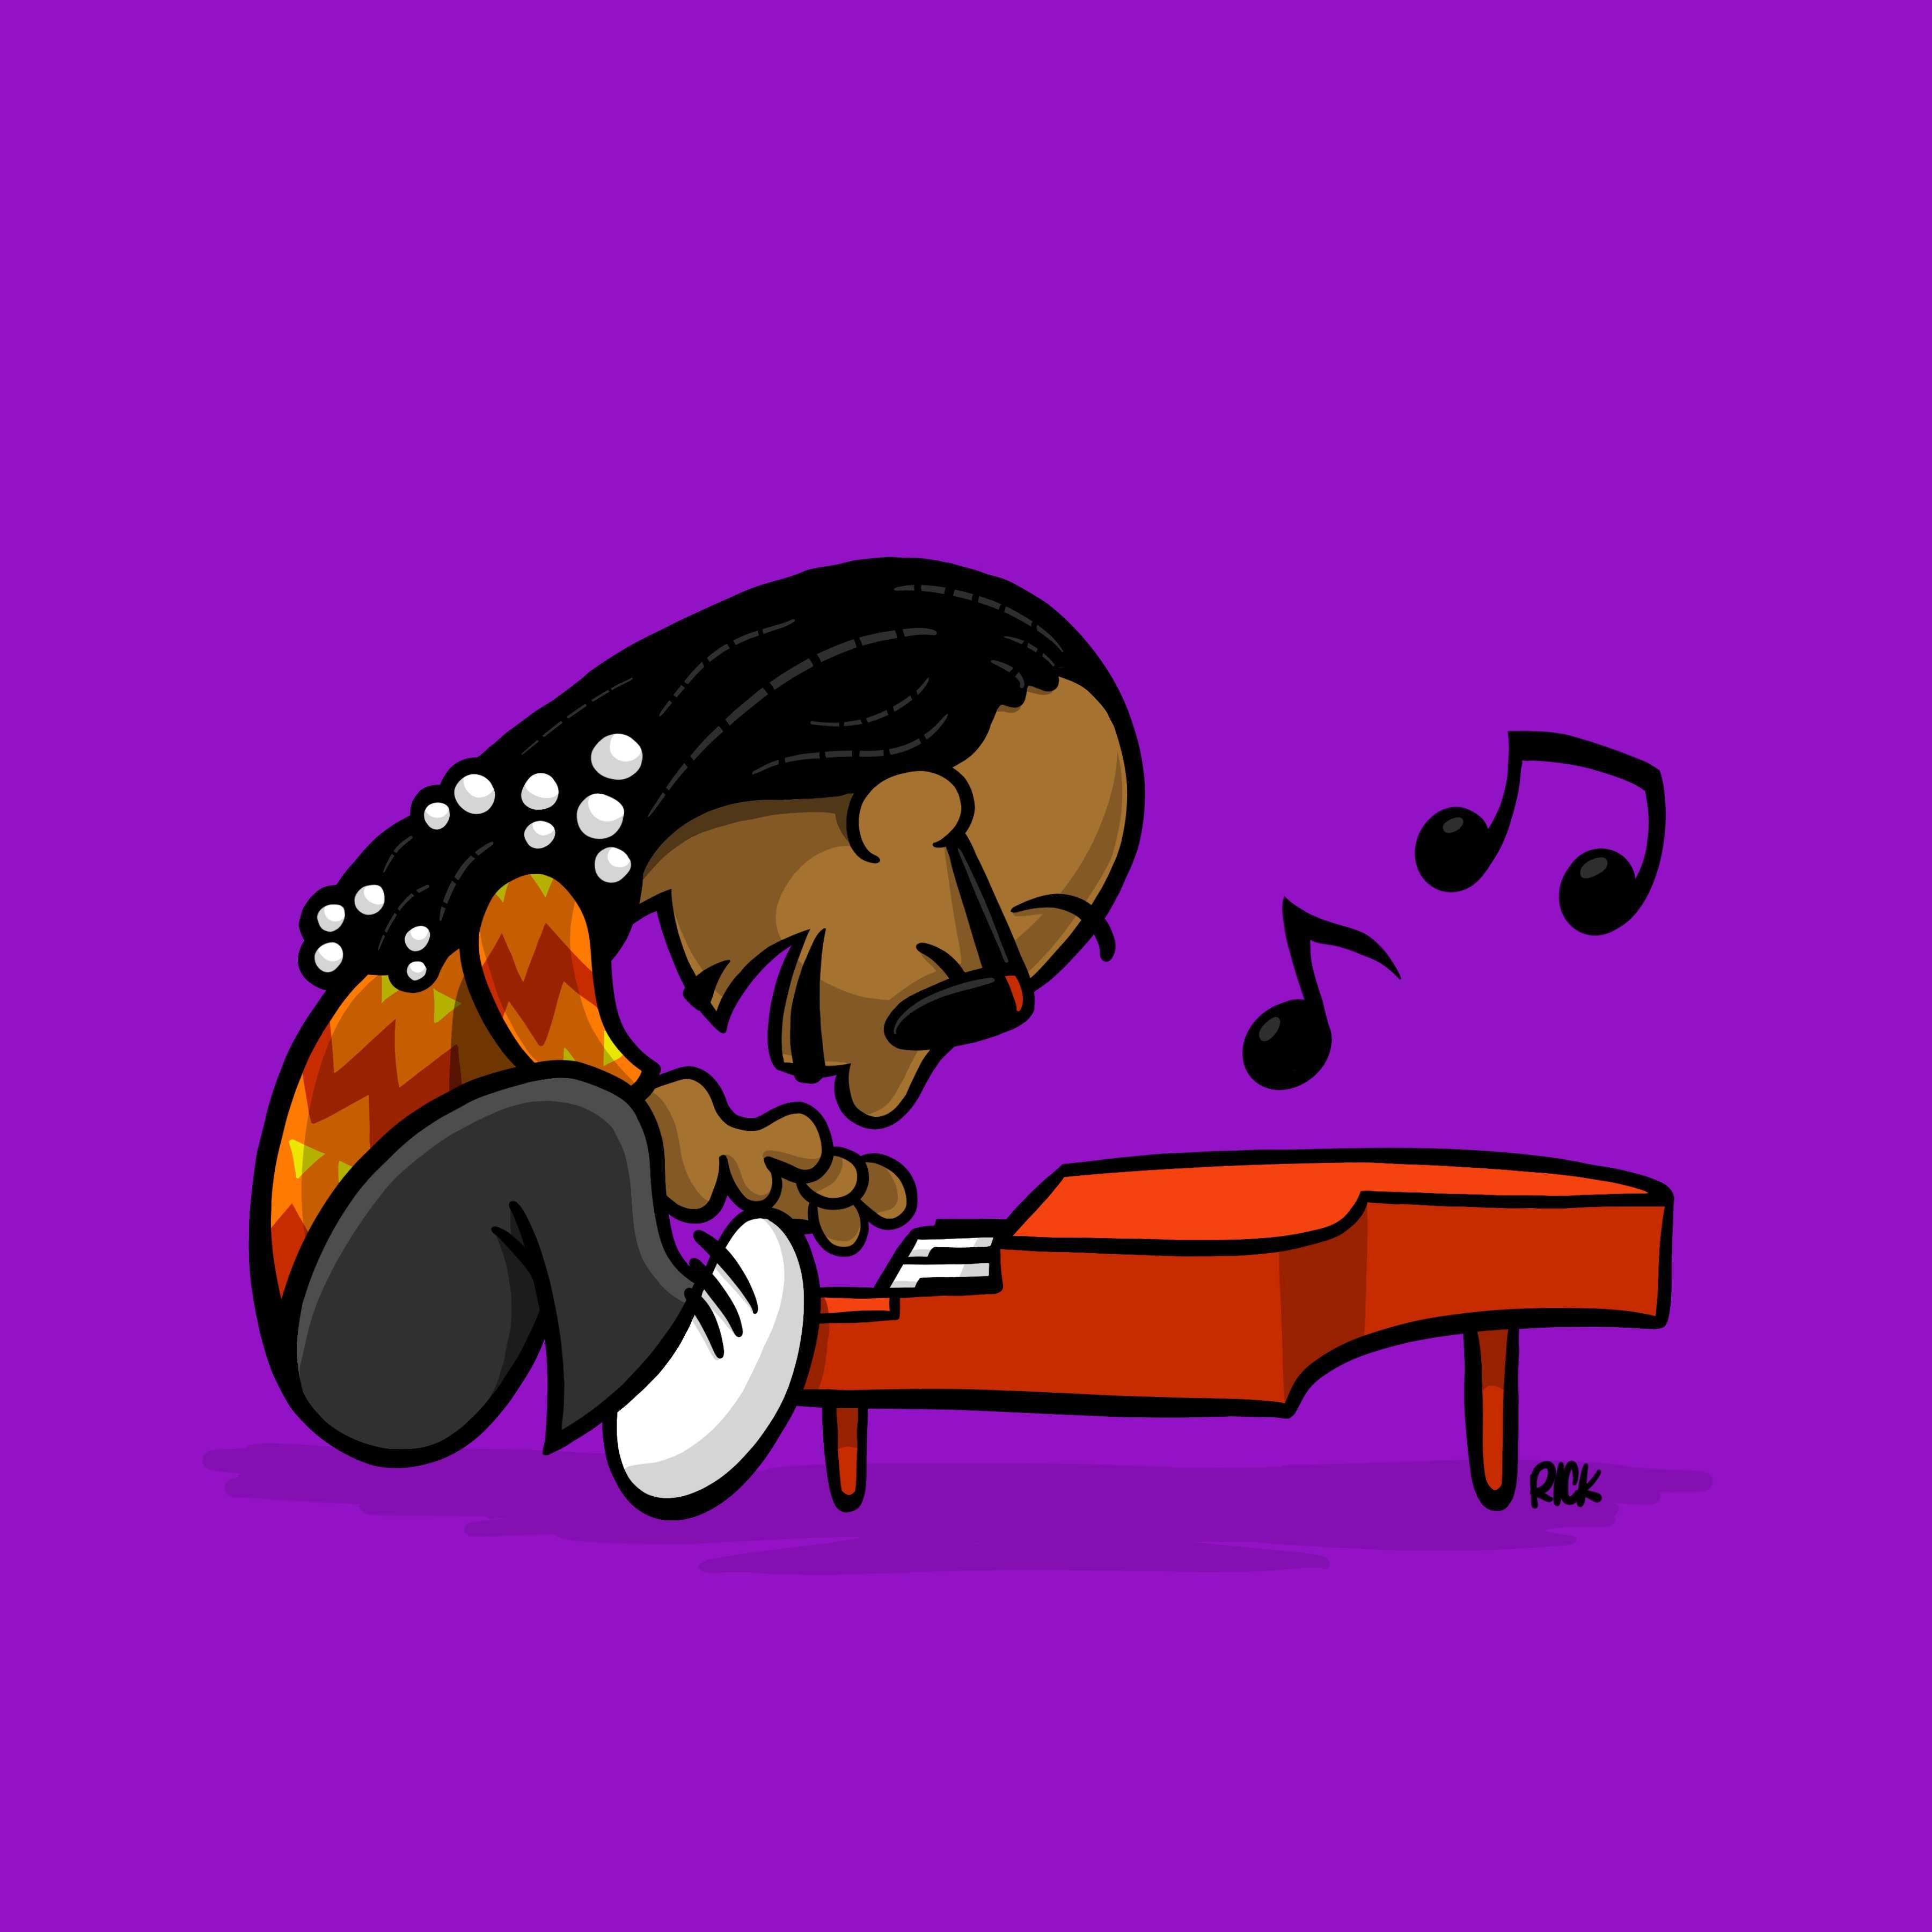 Stevie Wonder Schroeder Peanuts Fan Art Illustration Cartoon